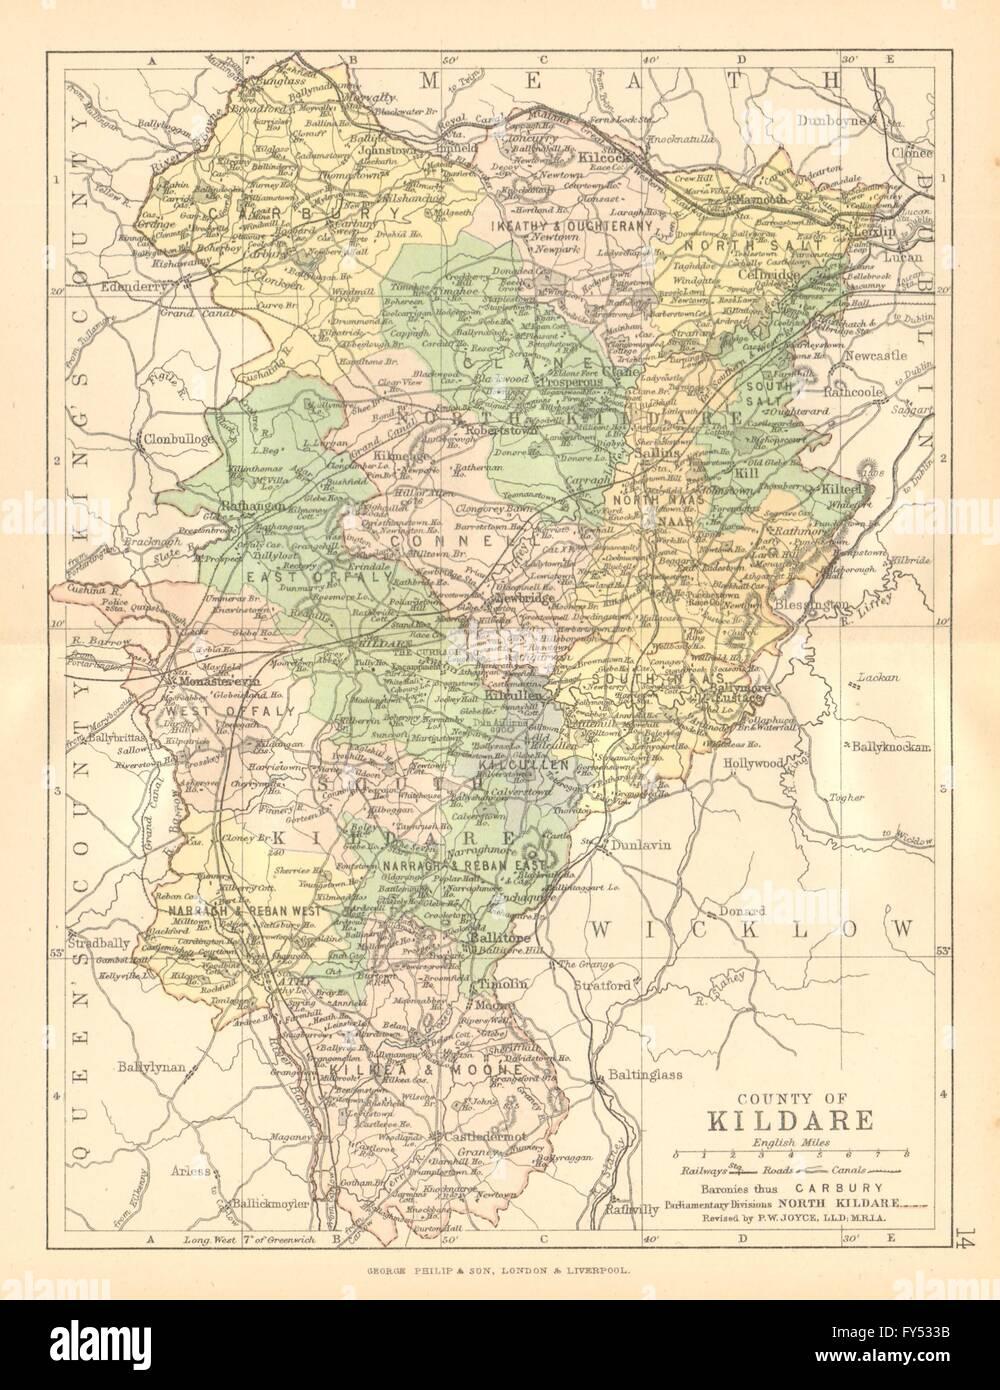 County Kildare Antique County Map Leinster Ireland Bartholomew